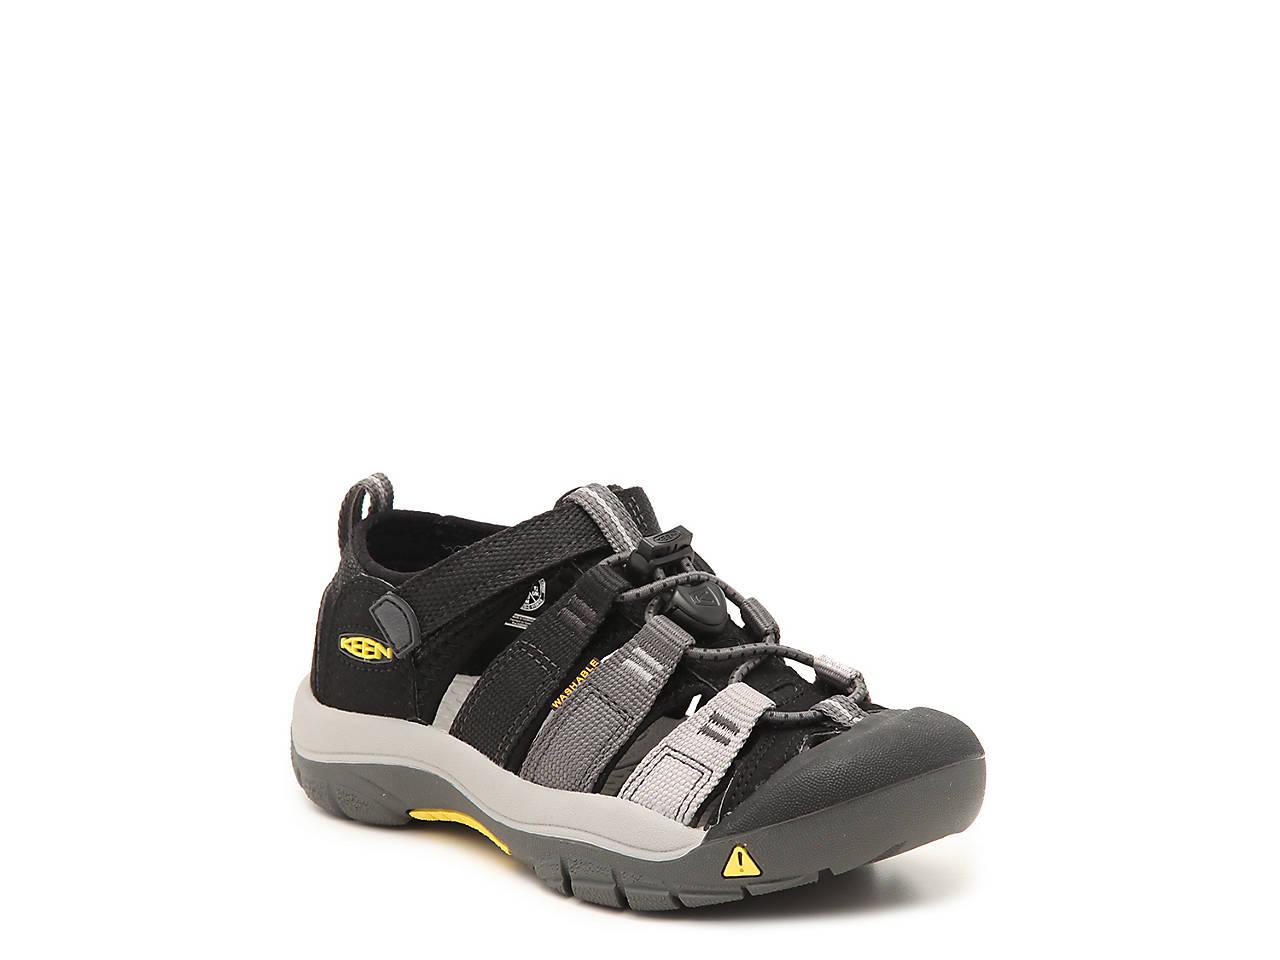 36dae6af05 Keen Newport H2 Toddler & Youth Sandal Kids Shoes | DSW